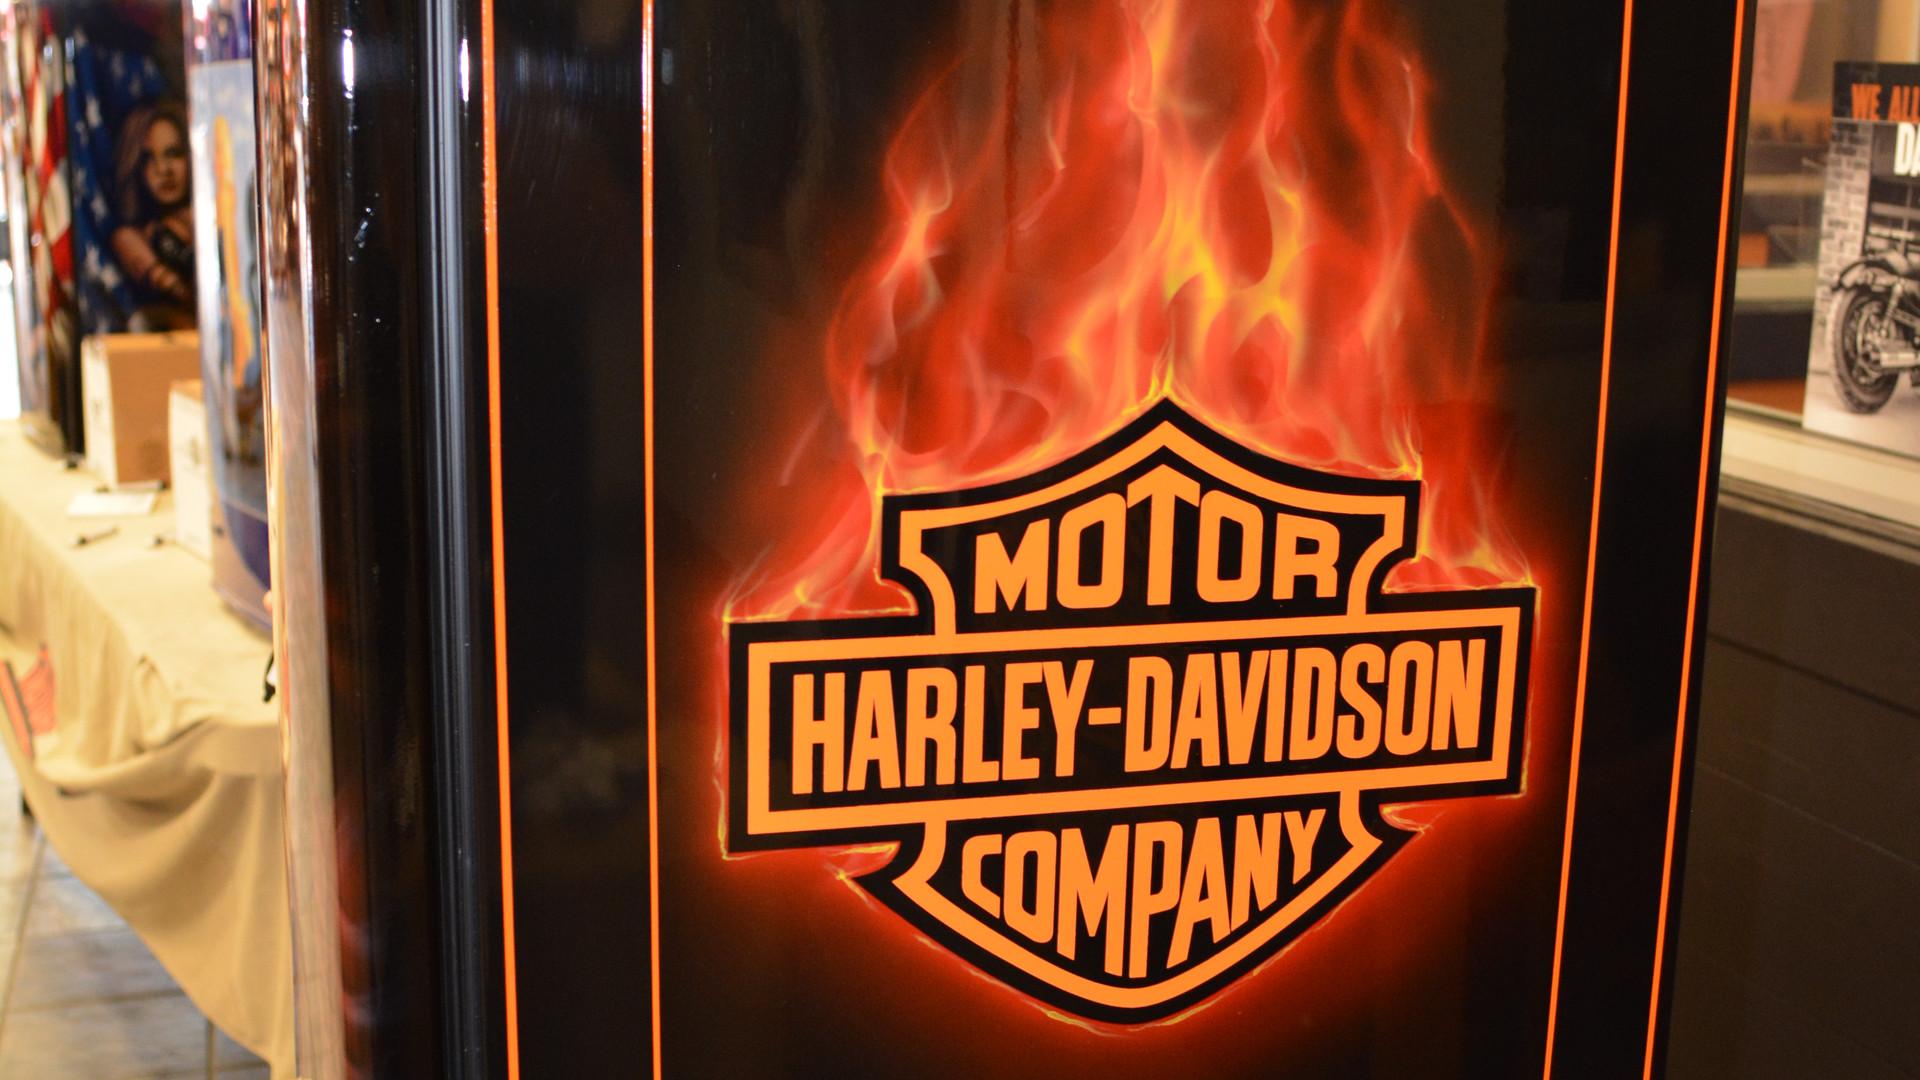 Harley Davidson on mini fridge.JPG